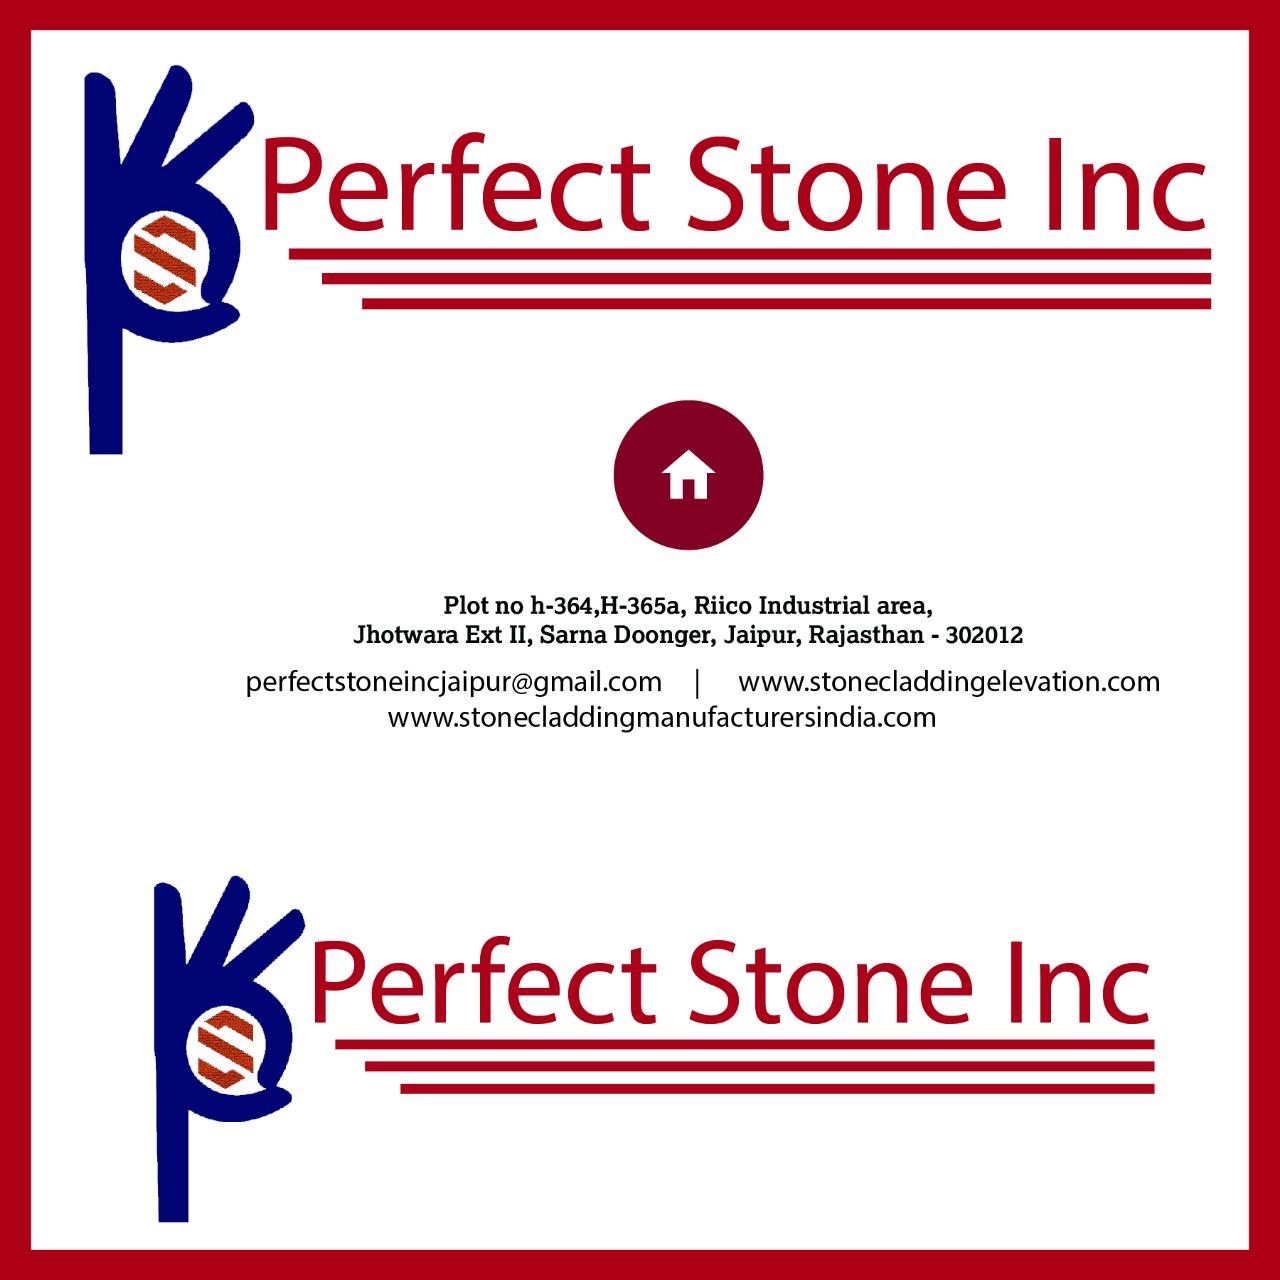 Perfect Stone Inc